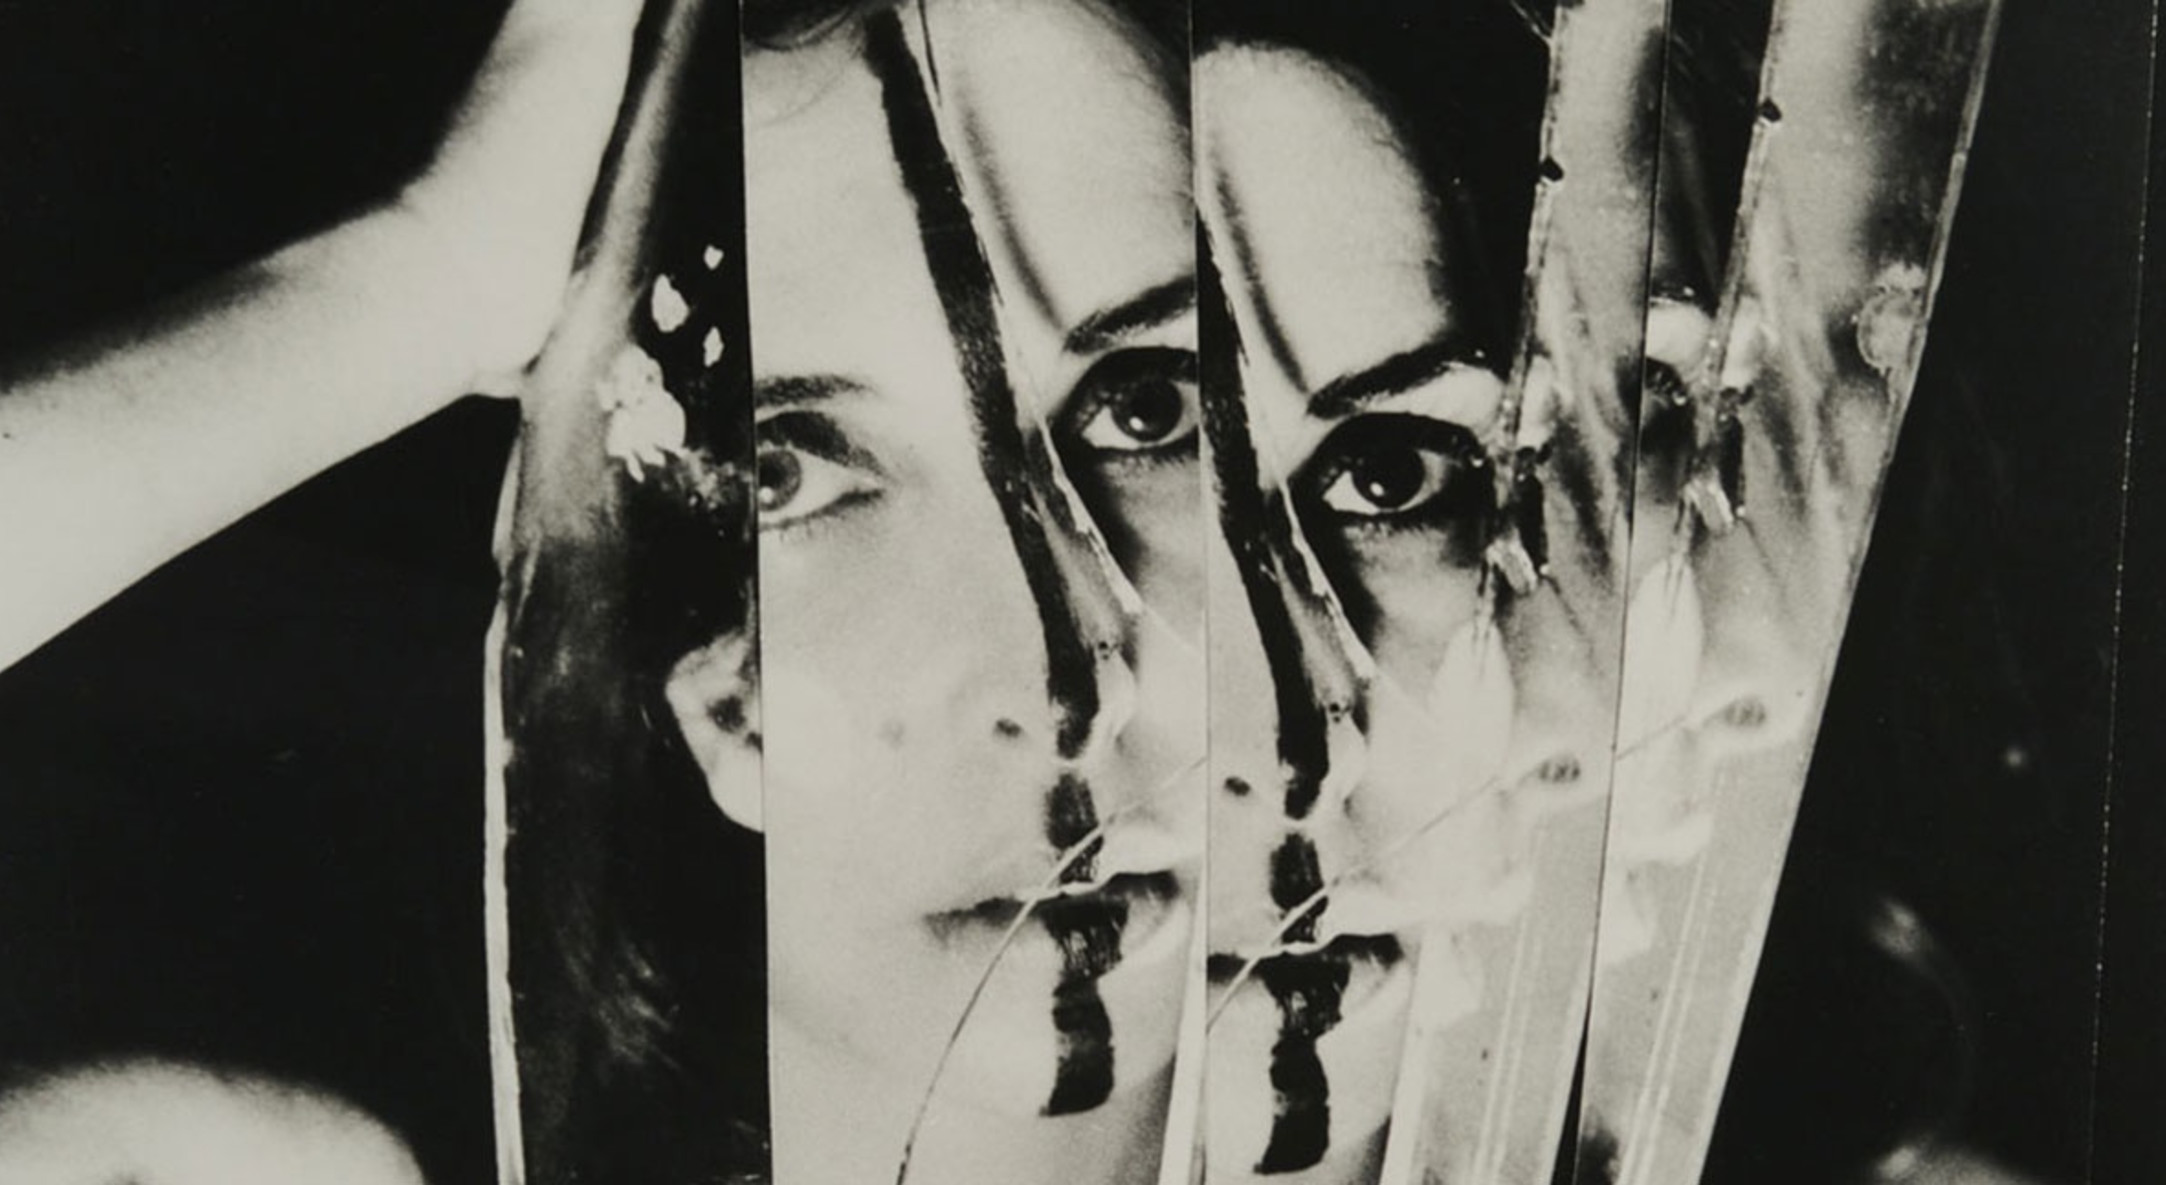 Detail of Carolee Schneemann, Eye Body #11, 1963/1989, Gelatin silver print, 27.9 x 35.6 cm, 11 x 14 in, Framed: 52.5 x 43.5 x 4 cm, 20 5/8 x 17 1/8 x 1 5/8 in